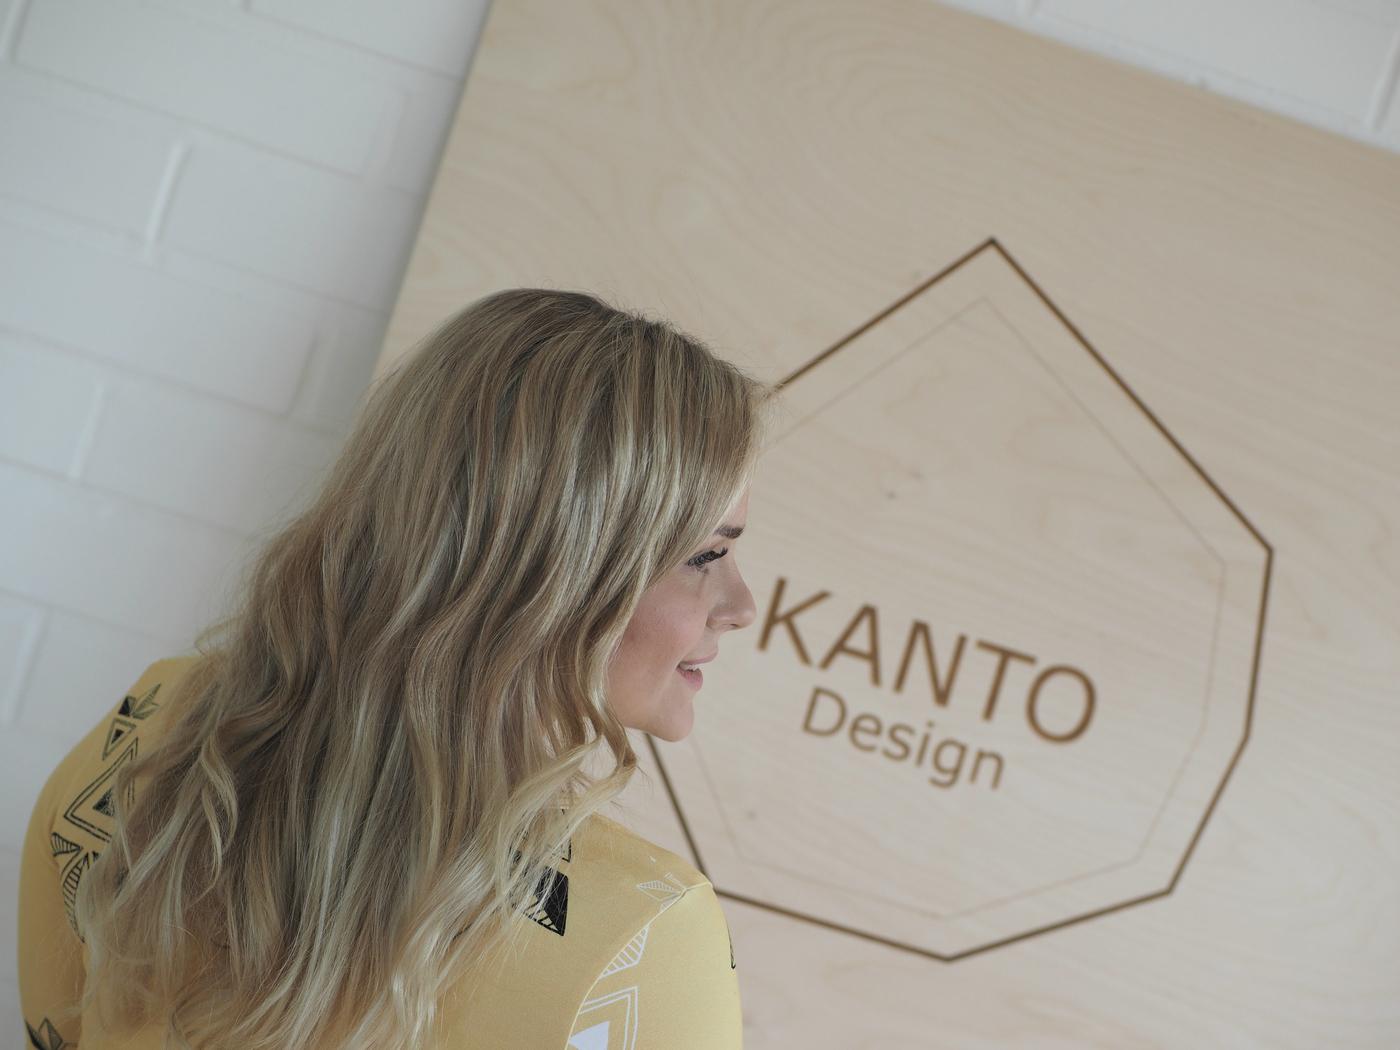 kanto-design-vaatteet.jpg